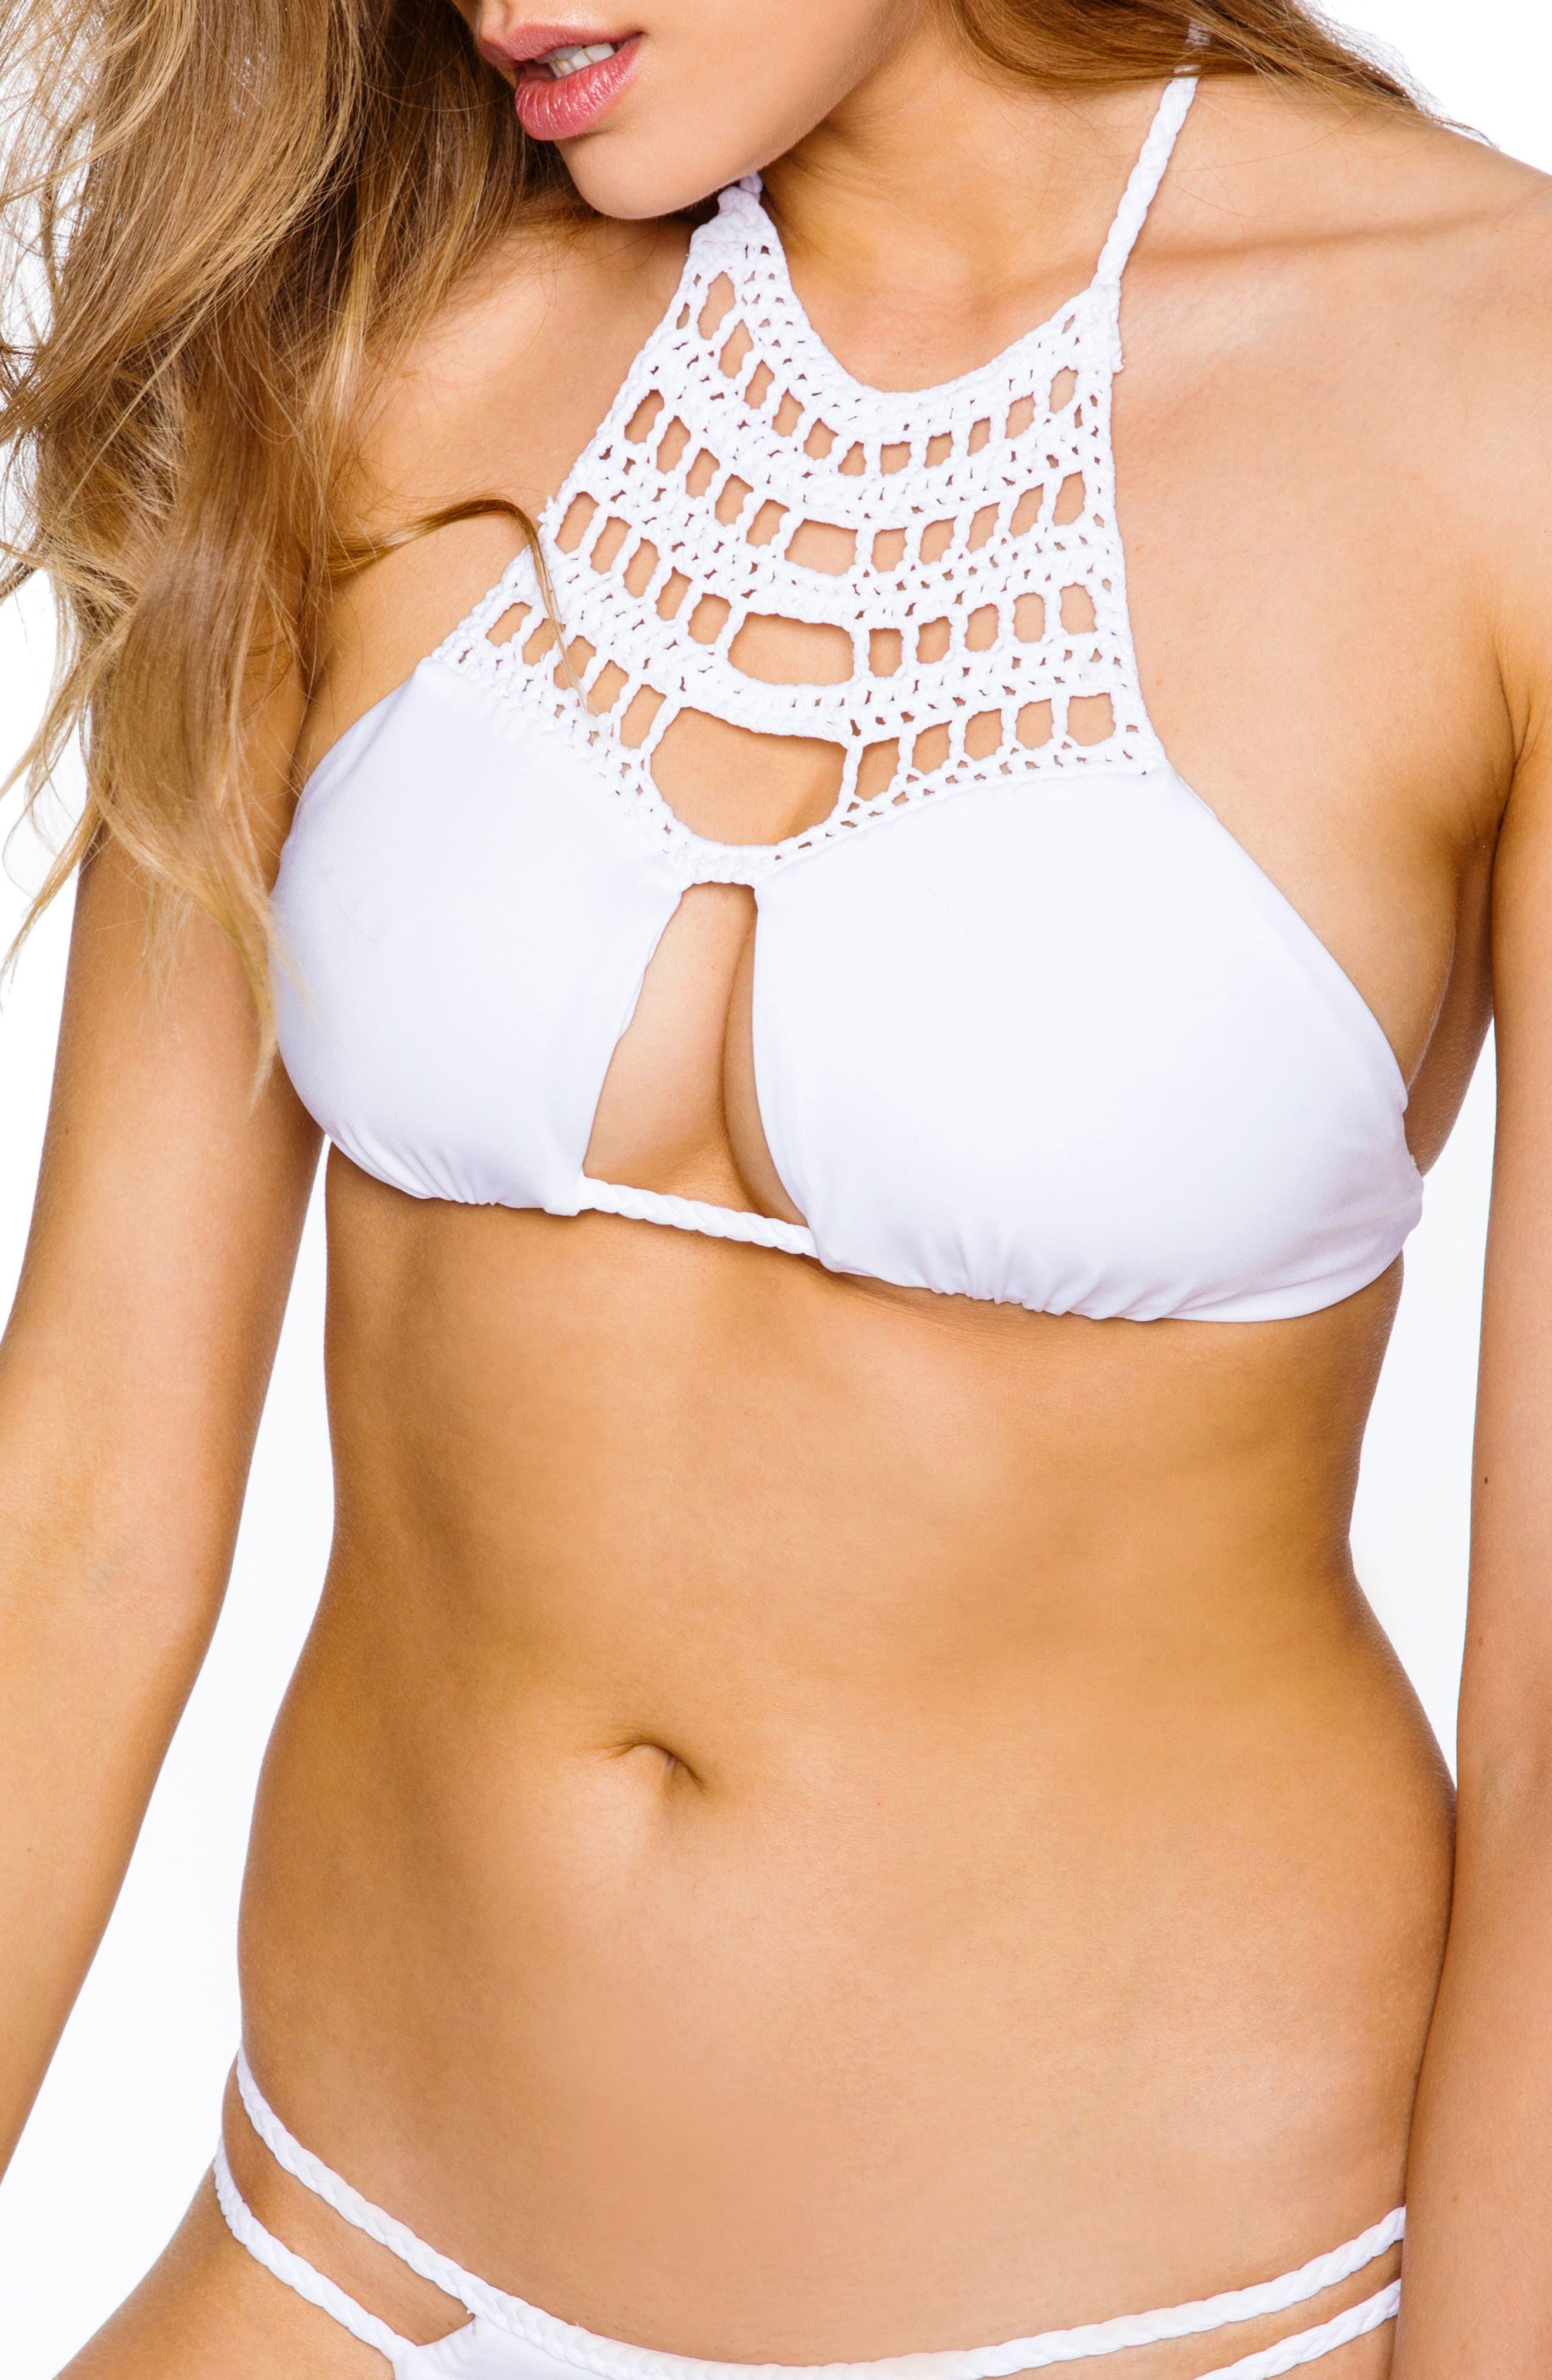 Main Image - Frankies Bikinis Mimi Bikini Top